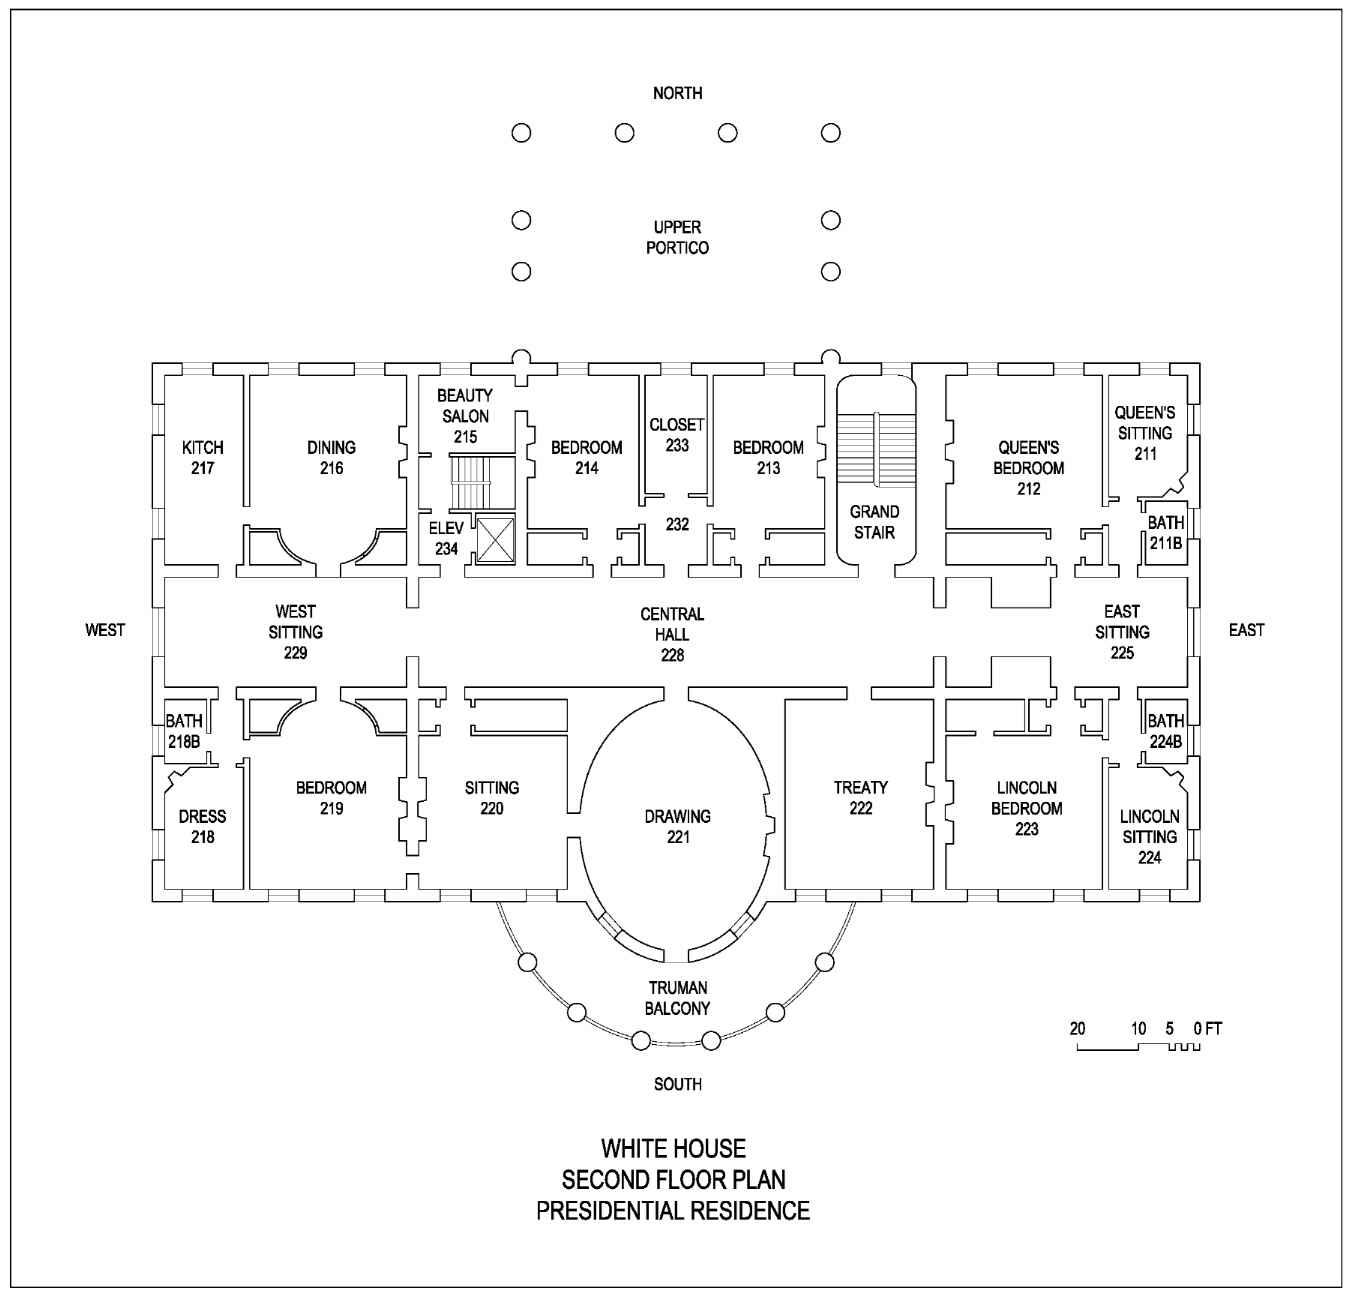 white house diagram dodge grand caravan parts schematics of the dimensions